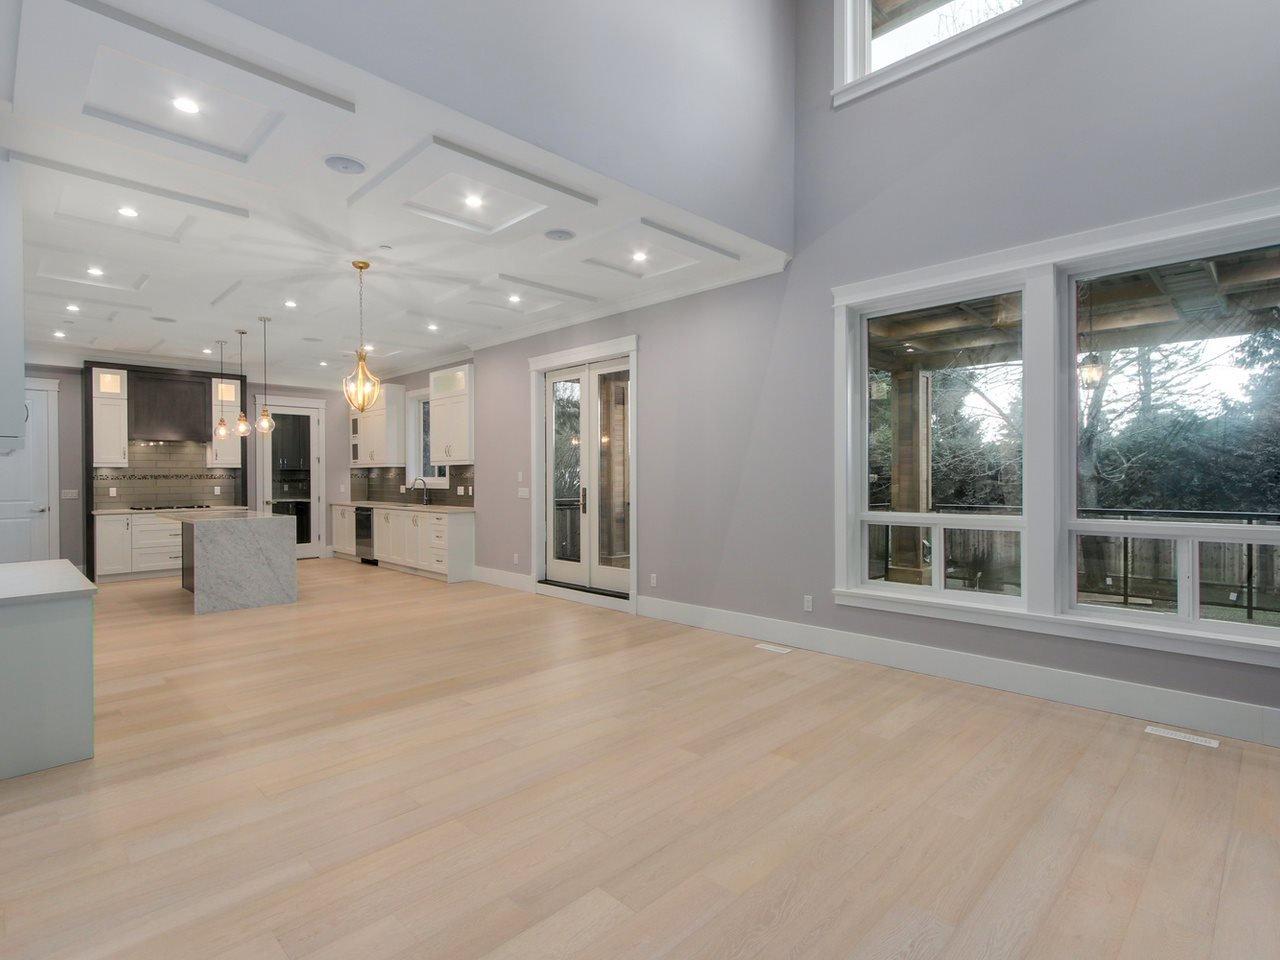 Photo 6: Photos: 1560 MAPLE Street: White Rock House for sale (South Surrey White Rock)  : MLS®# R2138926